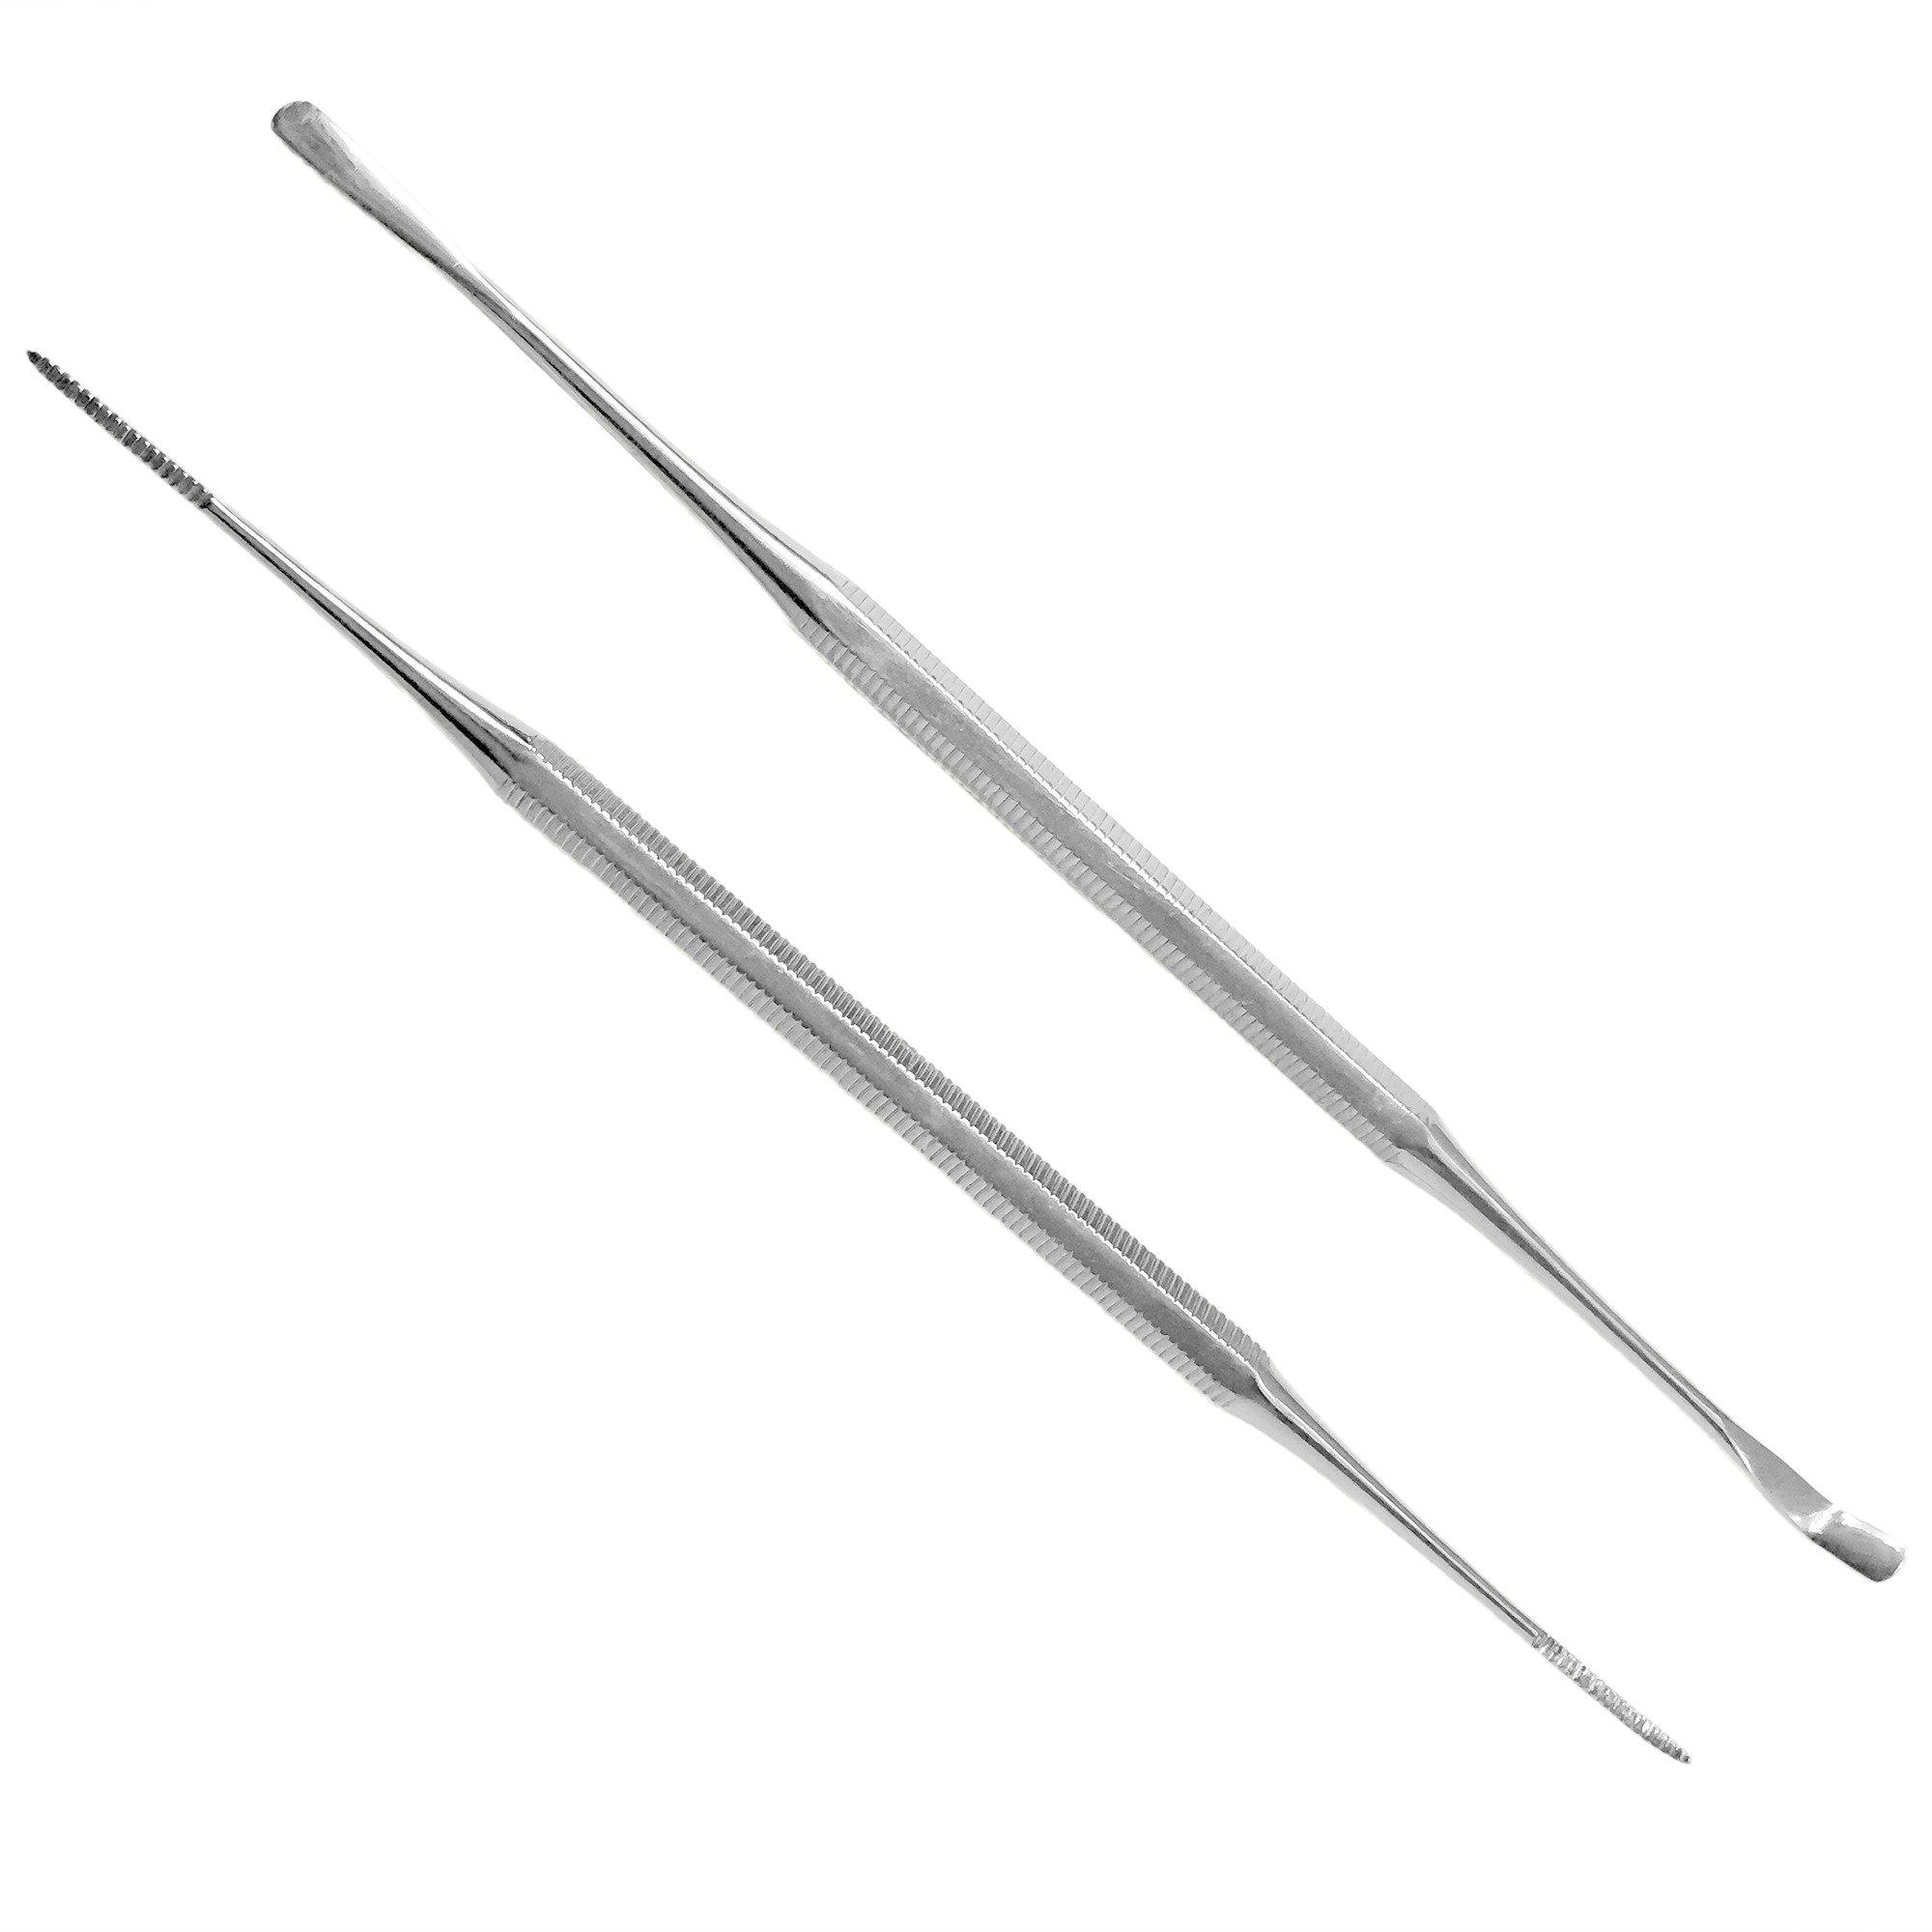 Ingrown Toenail File and Lifter Removal Tools Kit Nail Remover Set ...